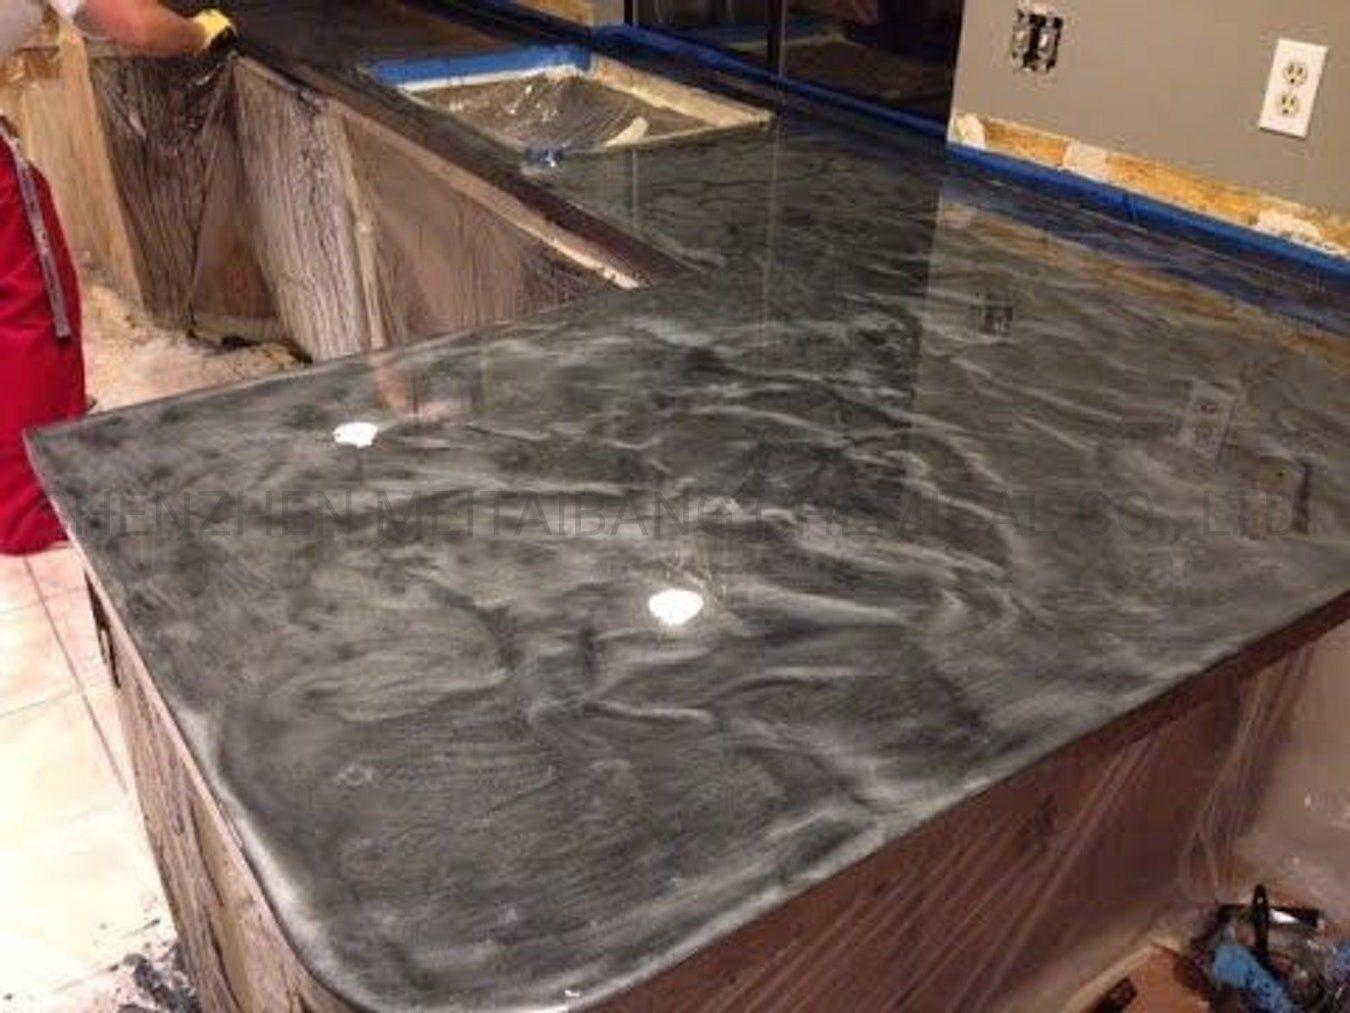 China Voc Free Metallic Countertop Epoxy Coating China Epoxy Resin For Kitchen Countertops Diy Resin Countertop For Kitchen